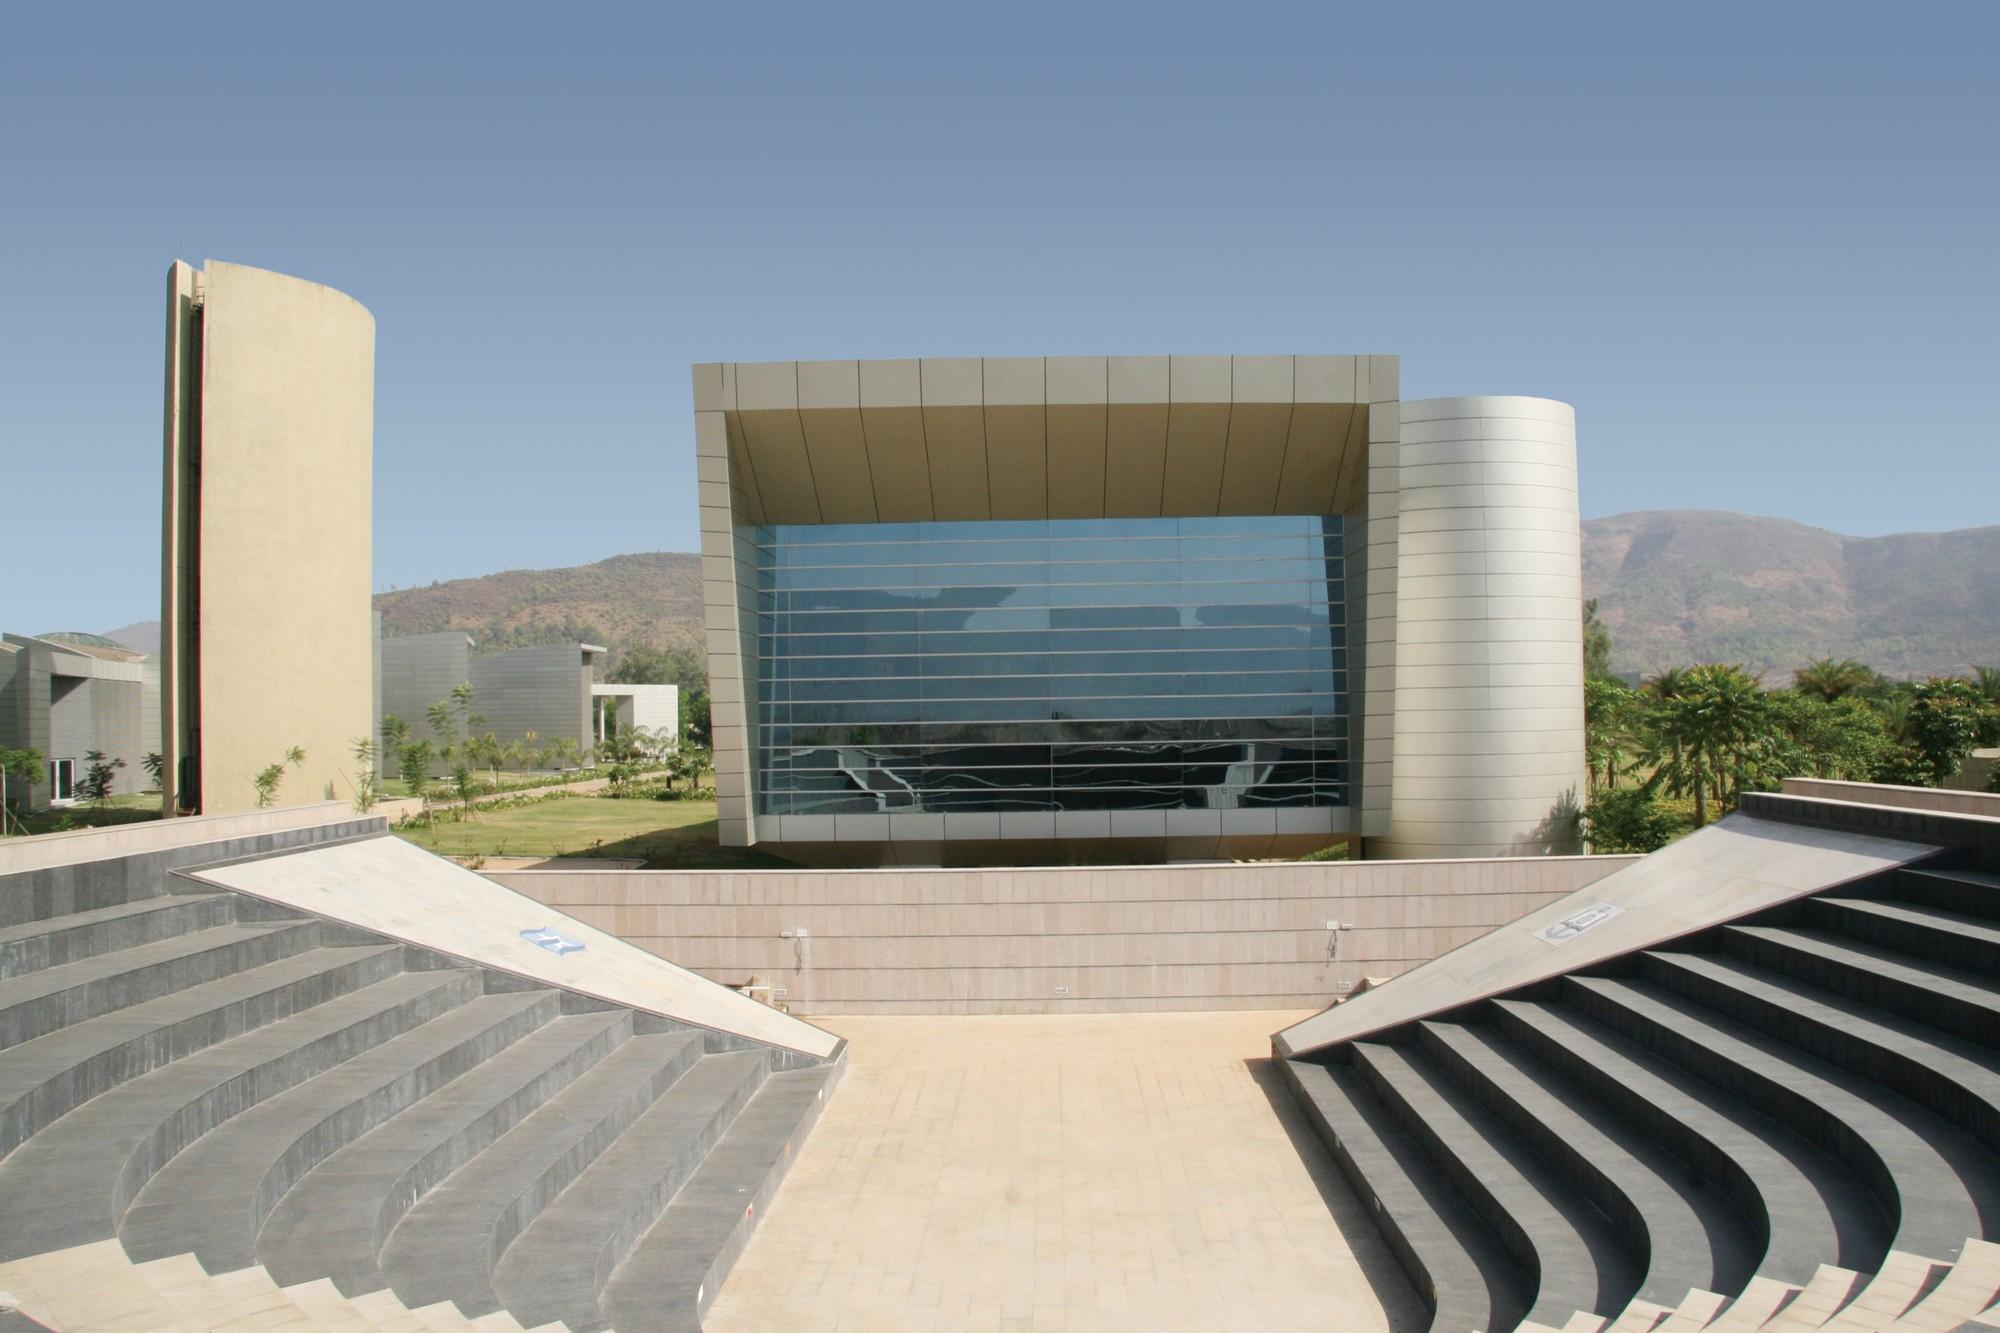 Samundra Institute of Maritime Studies / Christopher Charles Benninger Architects